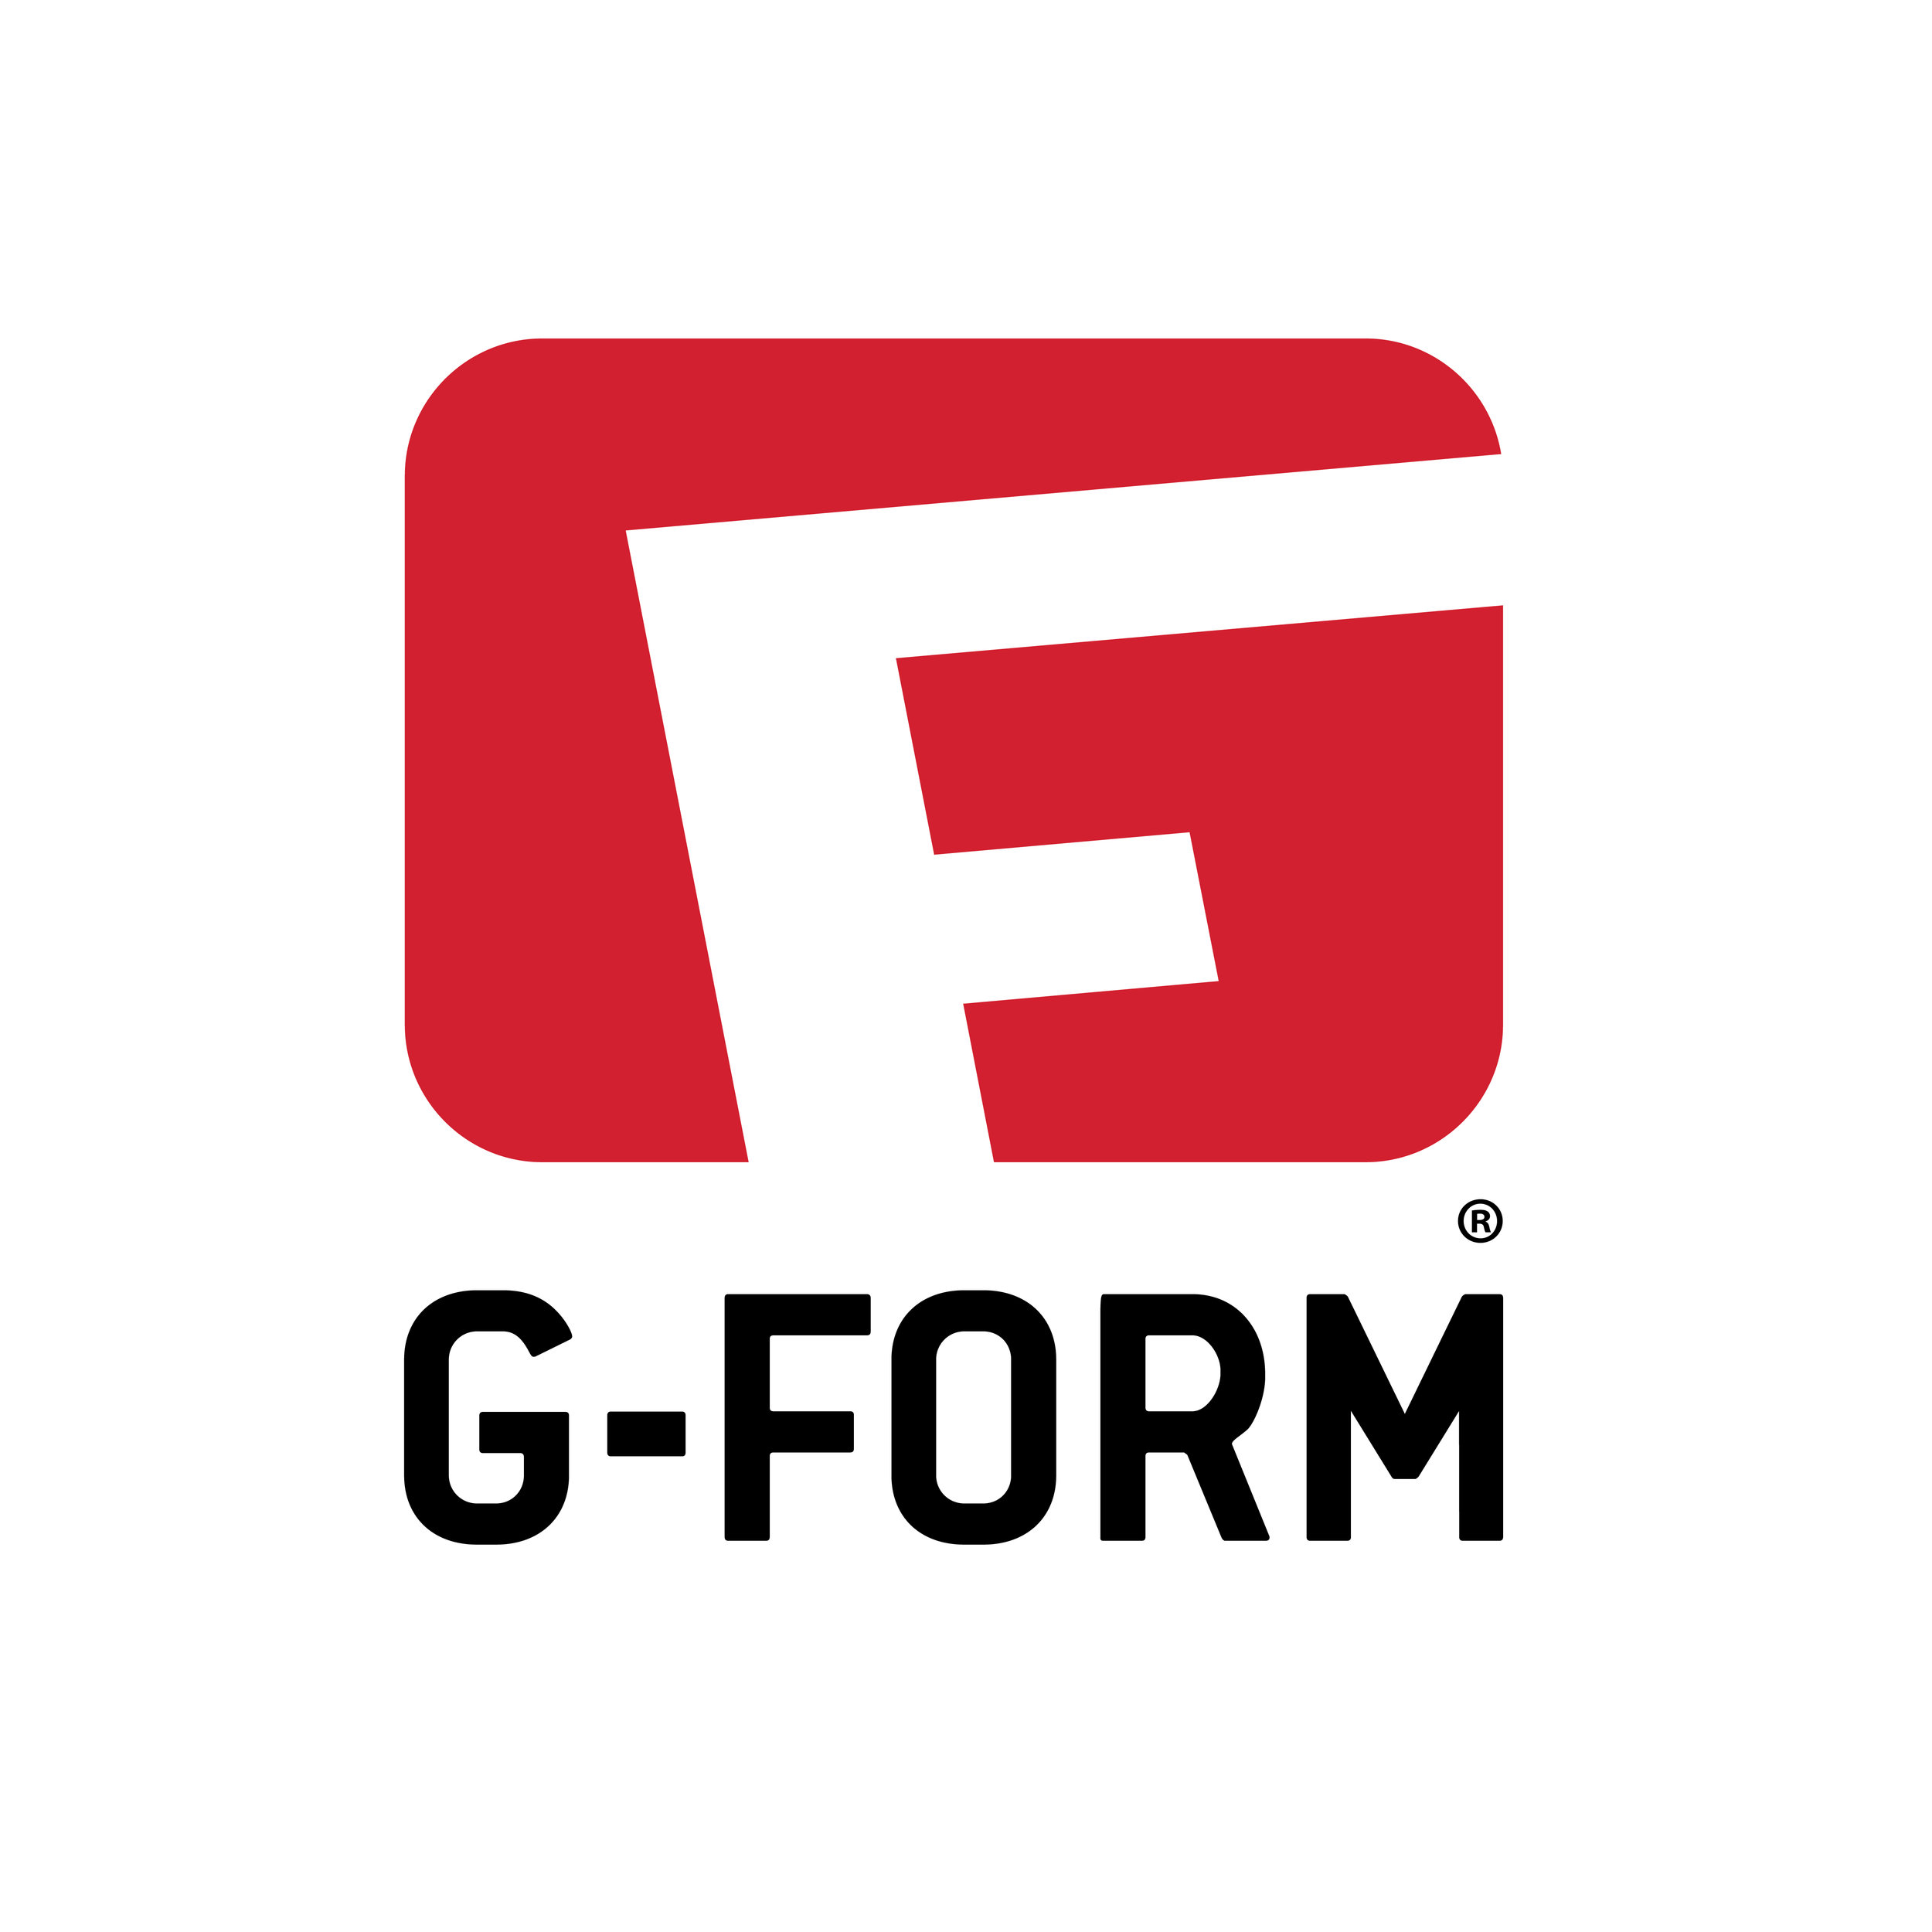 G-FormVertLogo(186-Blk)R.jpg